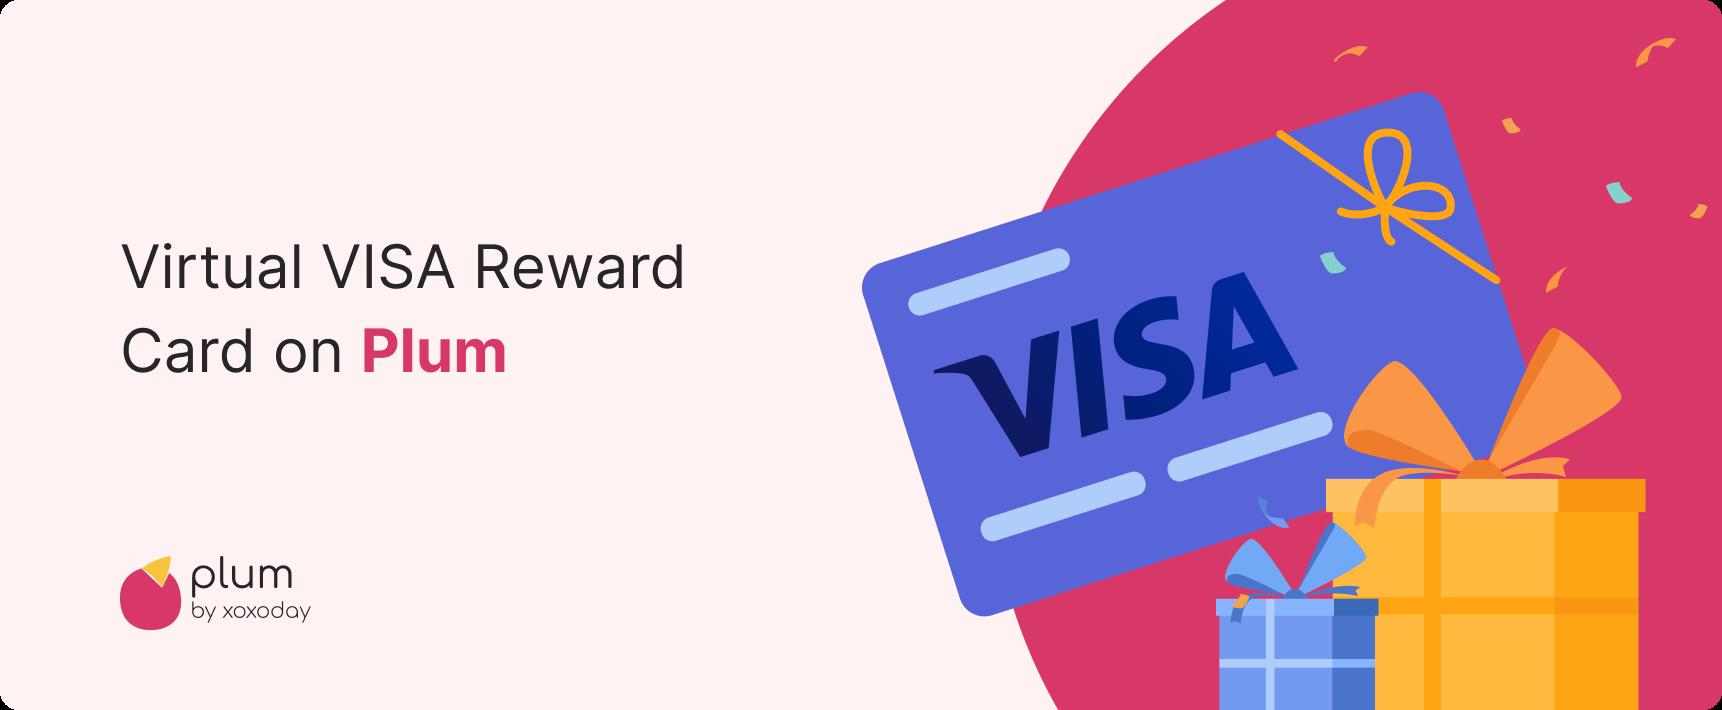 Virtual Visa reward card on Plum